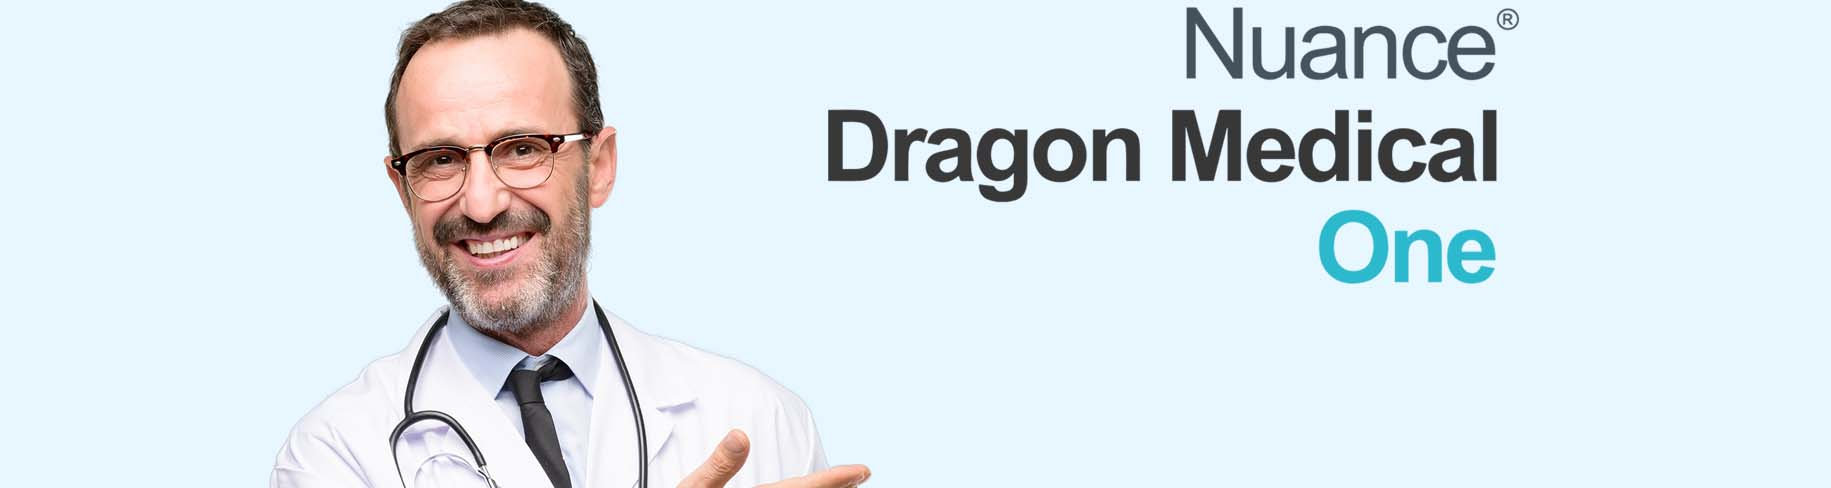 DNS Banner 1.jpg